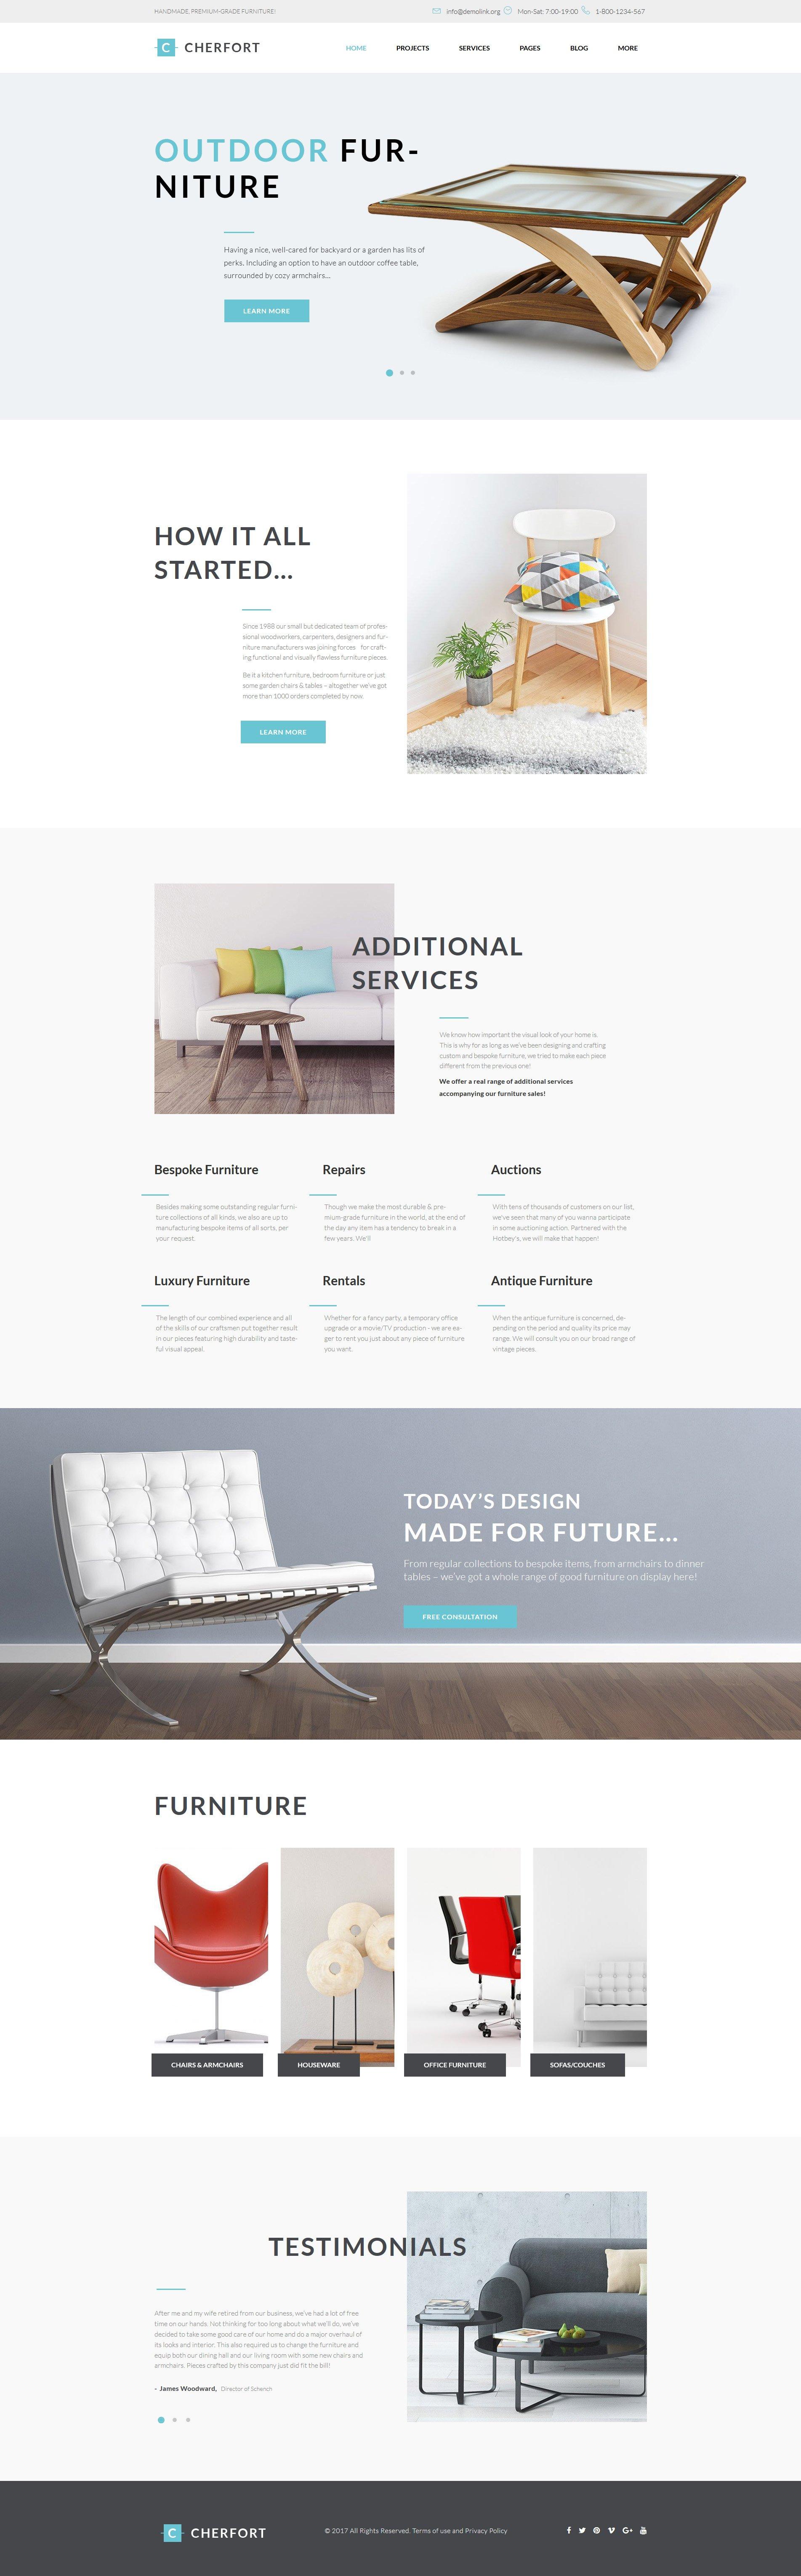 """Cherfort - Furniture Company Responsive"" thème WordPress adaptatif #64097"